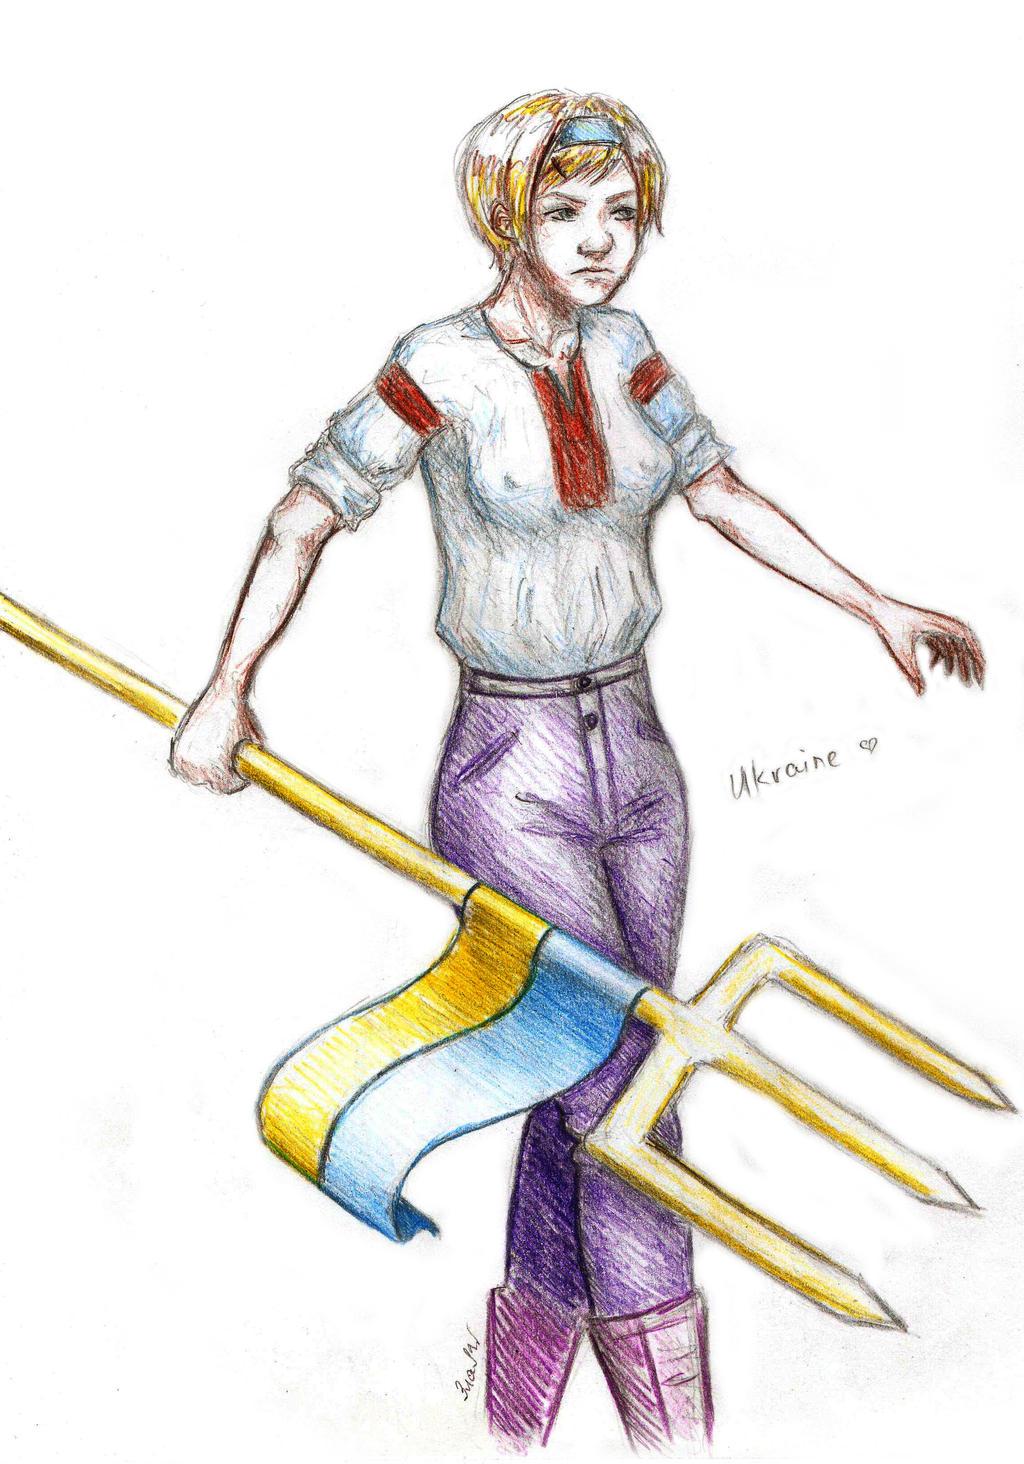 Ukraine and trident by GoldenYume